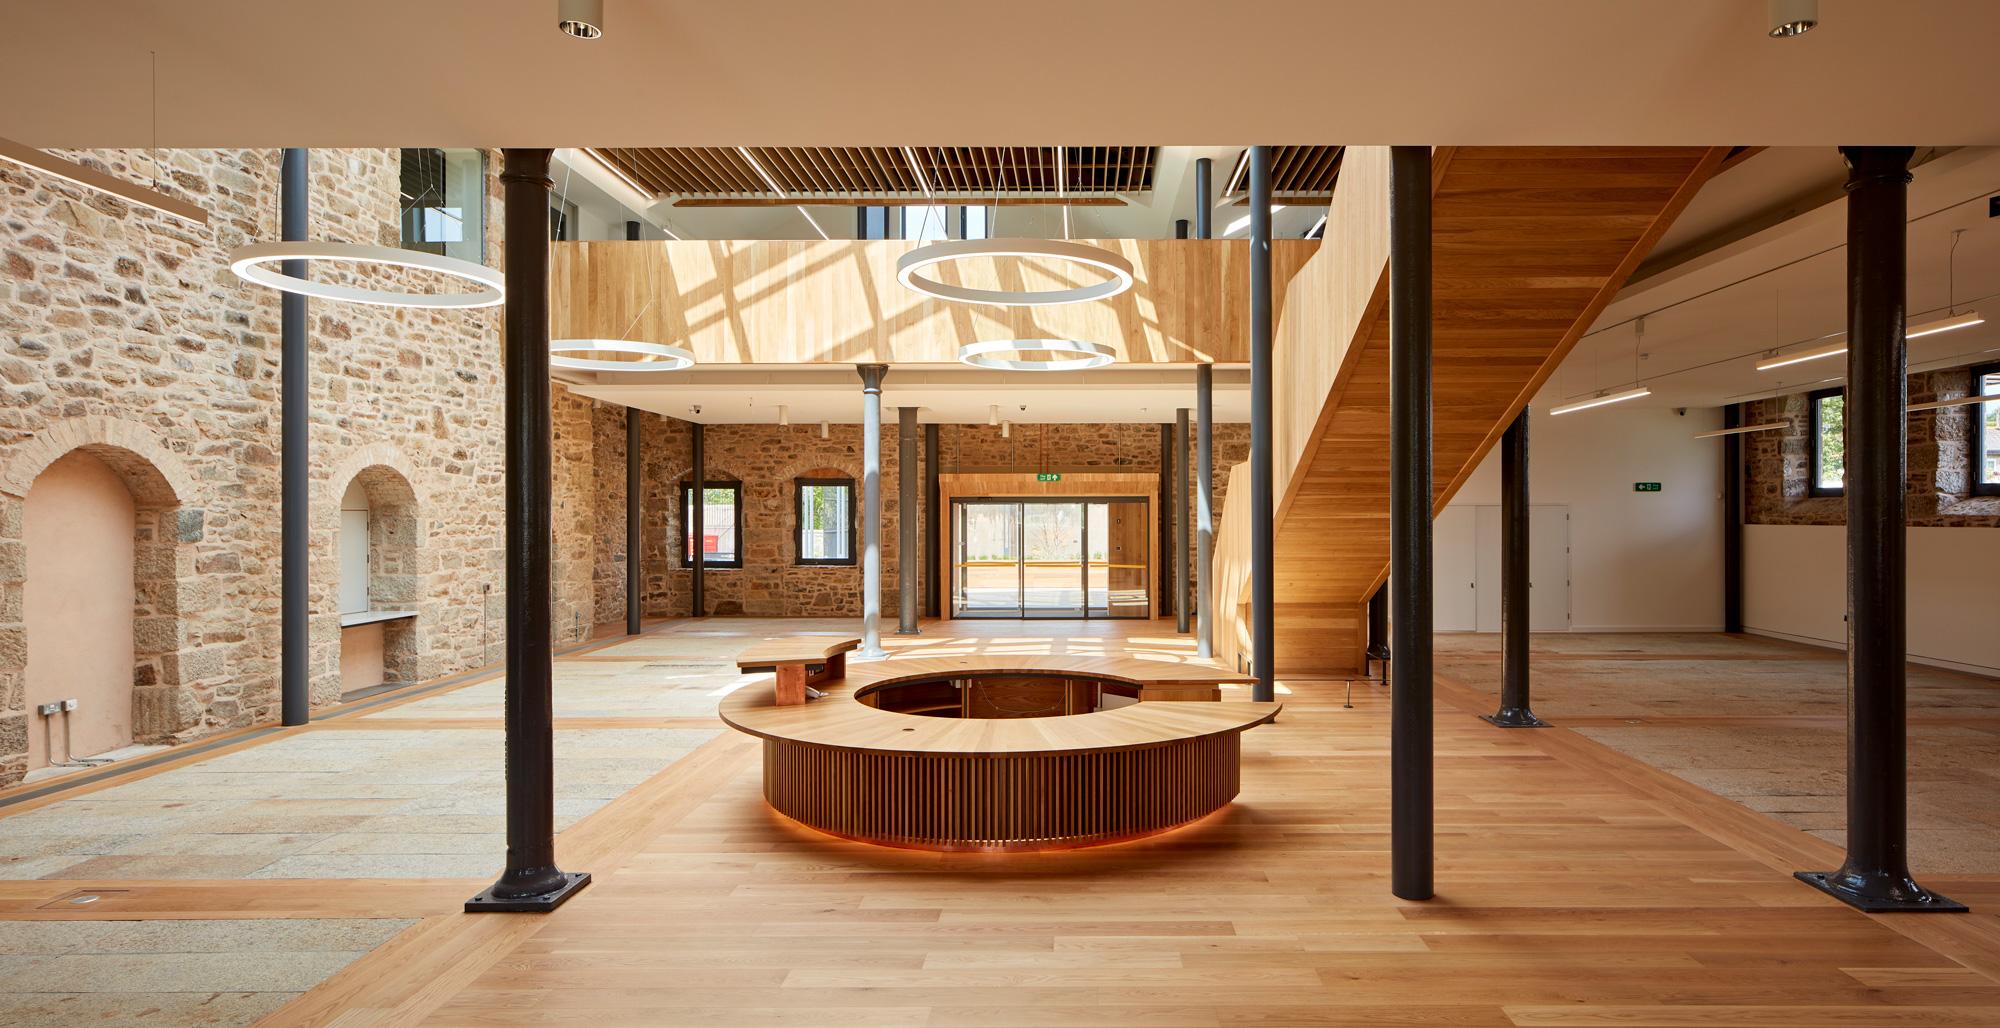 Engineered wood flooring installation at Kresen Kernow